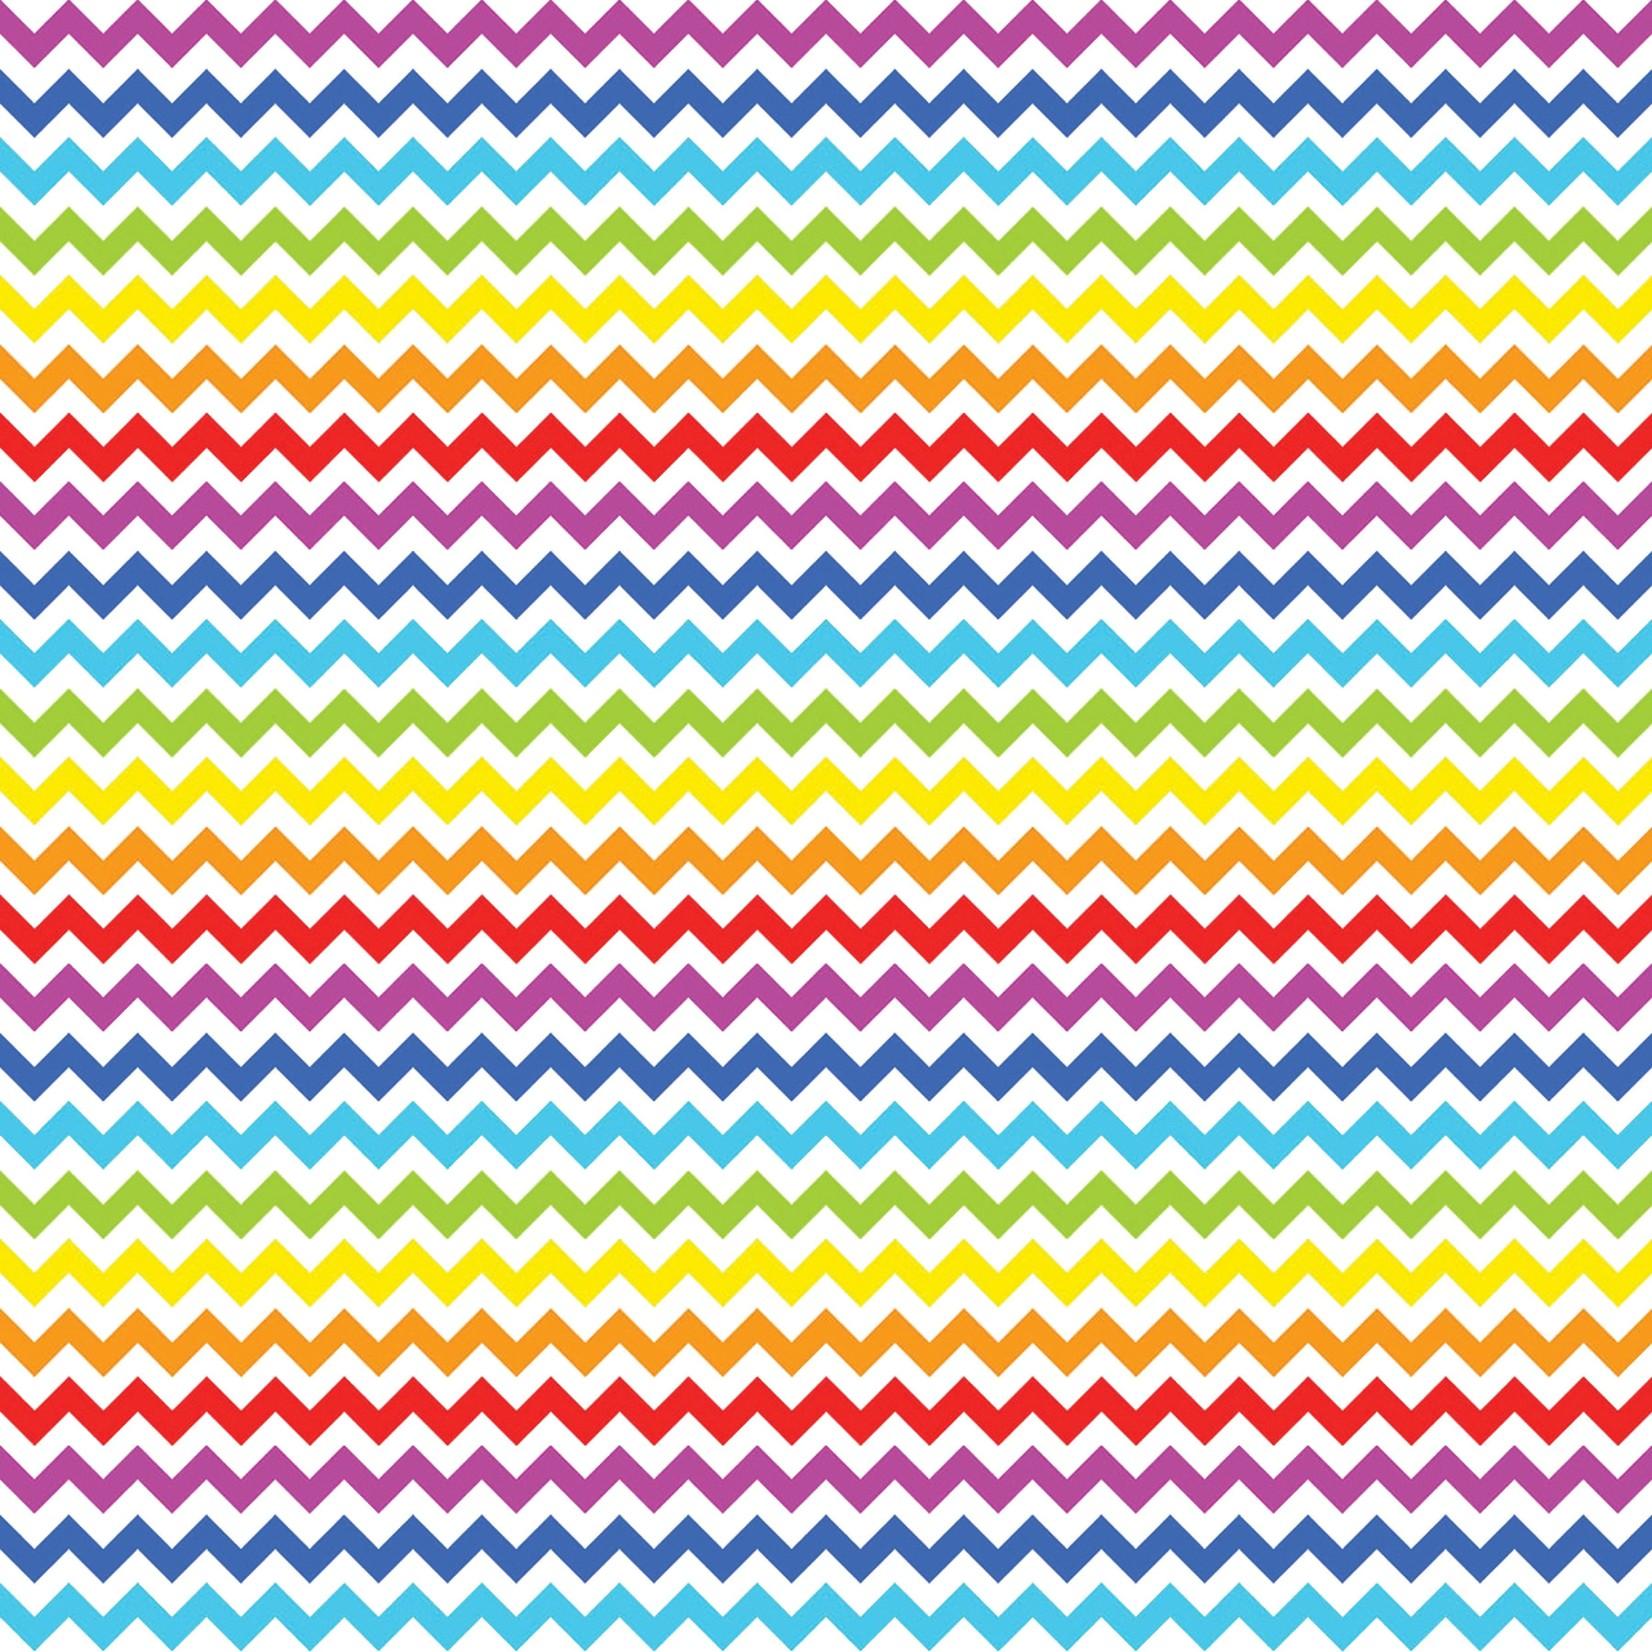 TVD Rainbow Chevron